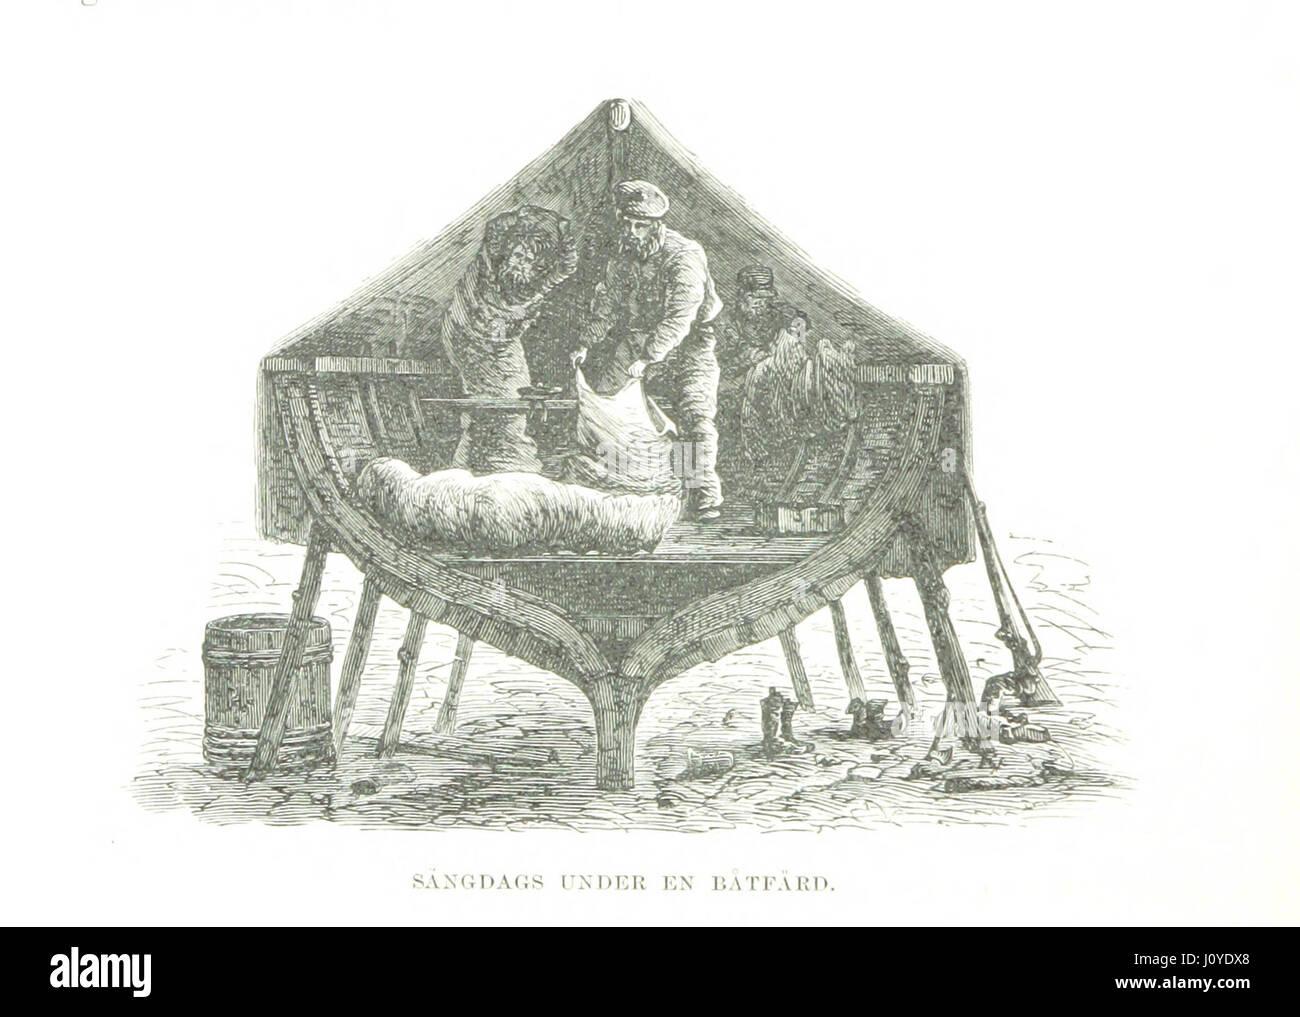 Image taken from page 126 of 'Svenska Polar-Expeditionen år 1868 med kronoåufartyget Sofia. Reseskizzer, etc' Stock Photo